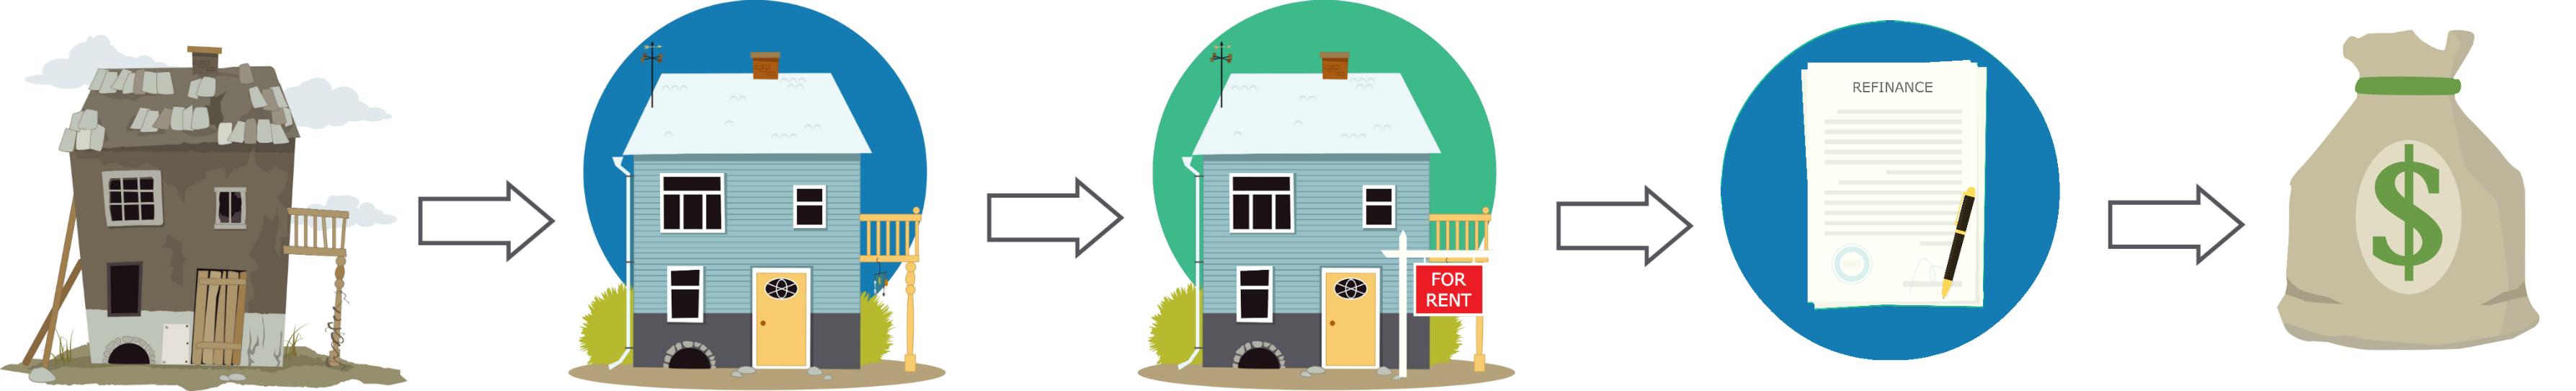 Real Estate Wholesaling Infographic